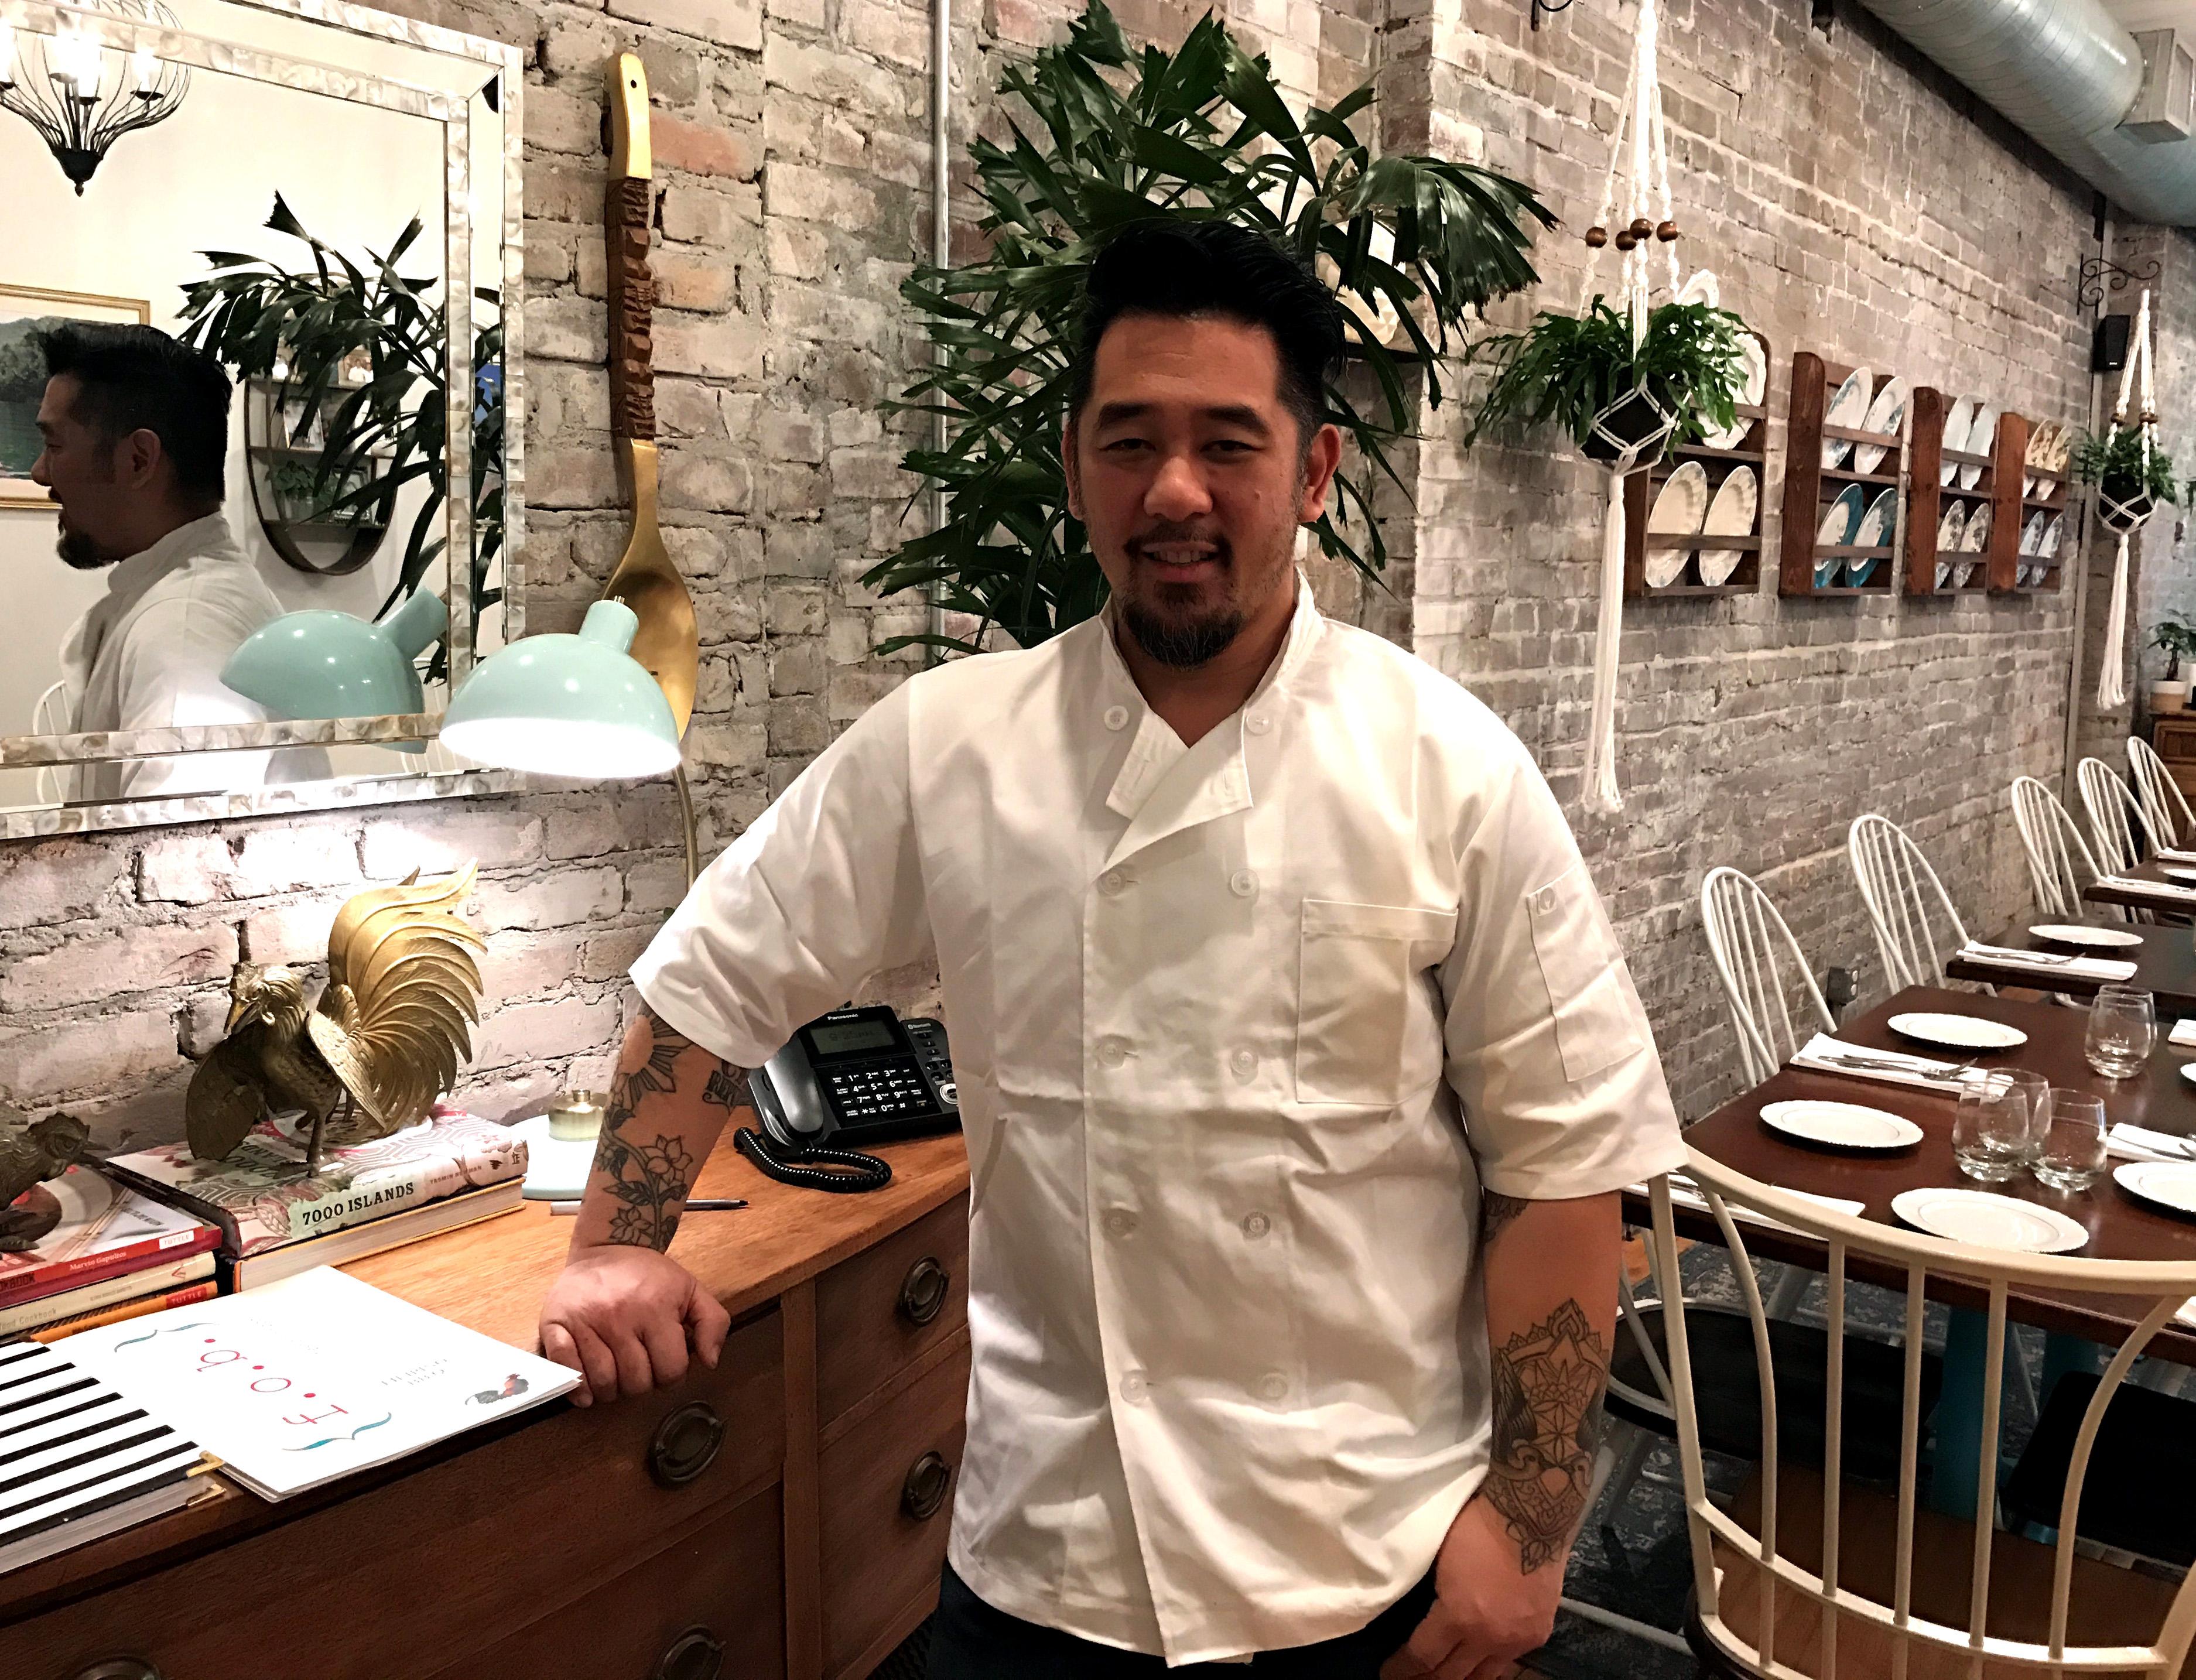 13 Under the Radar Chefs to Watch in NYC Zagat